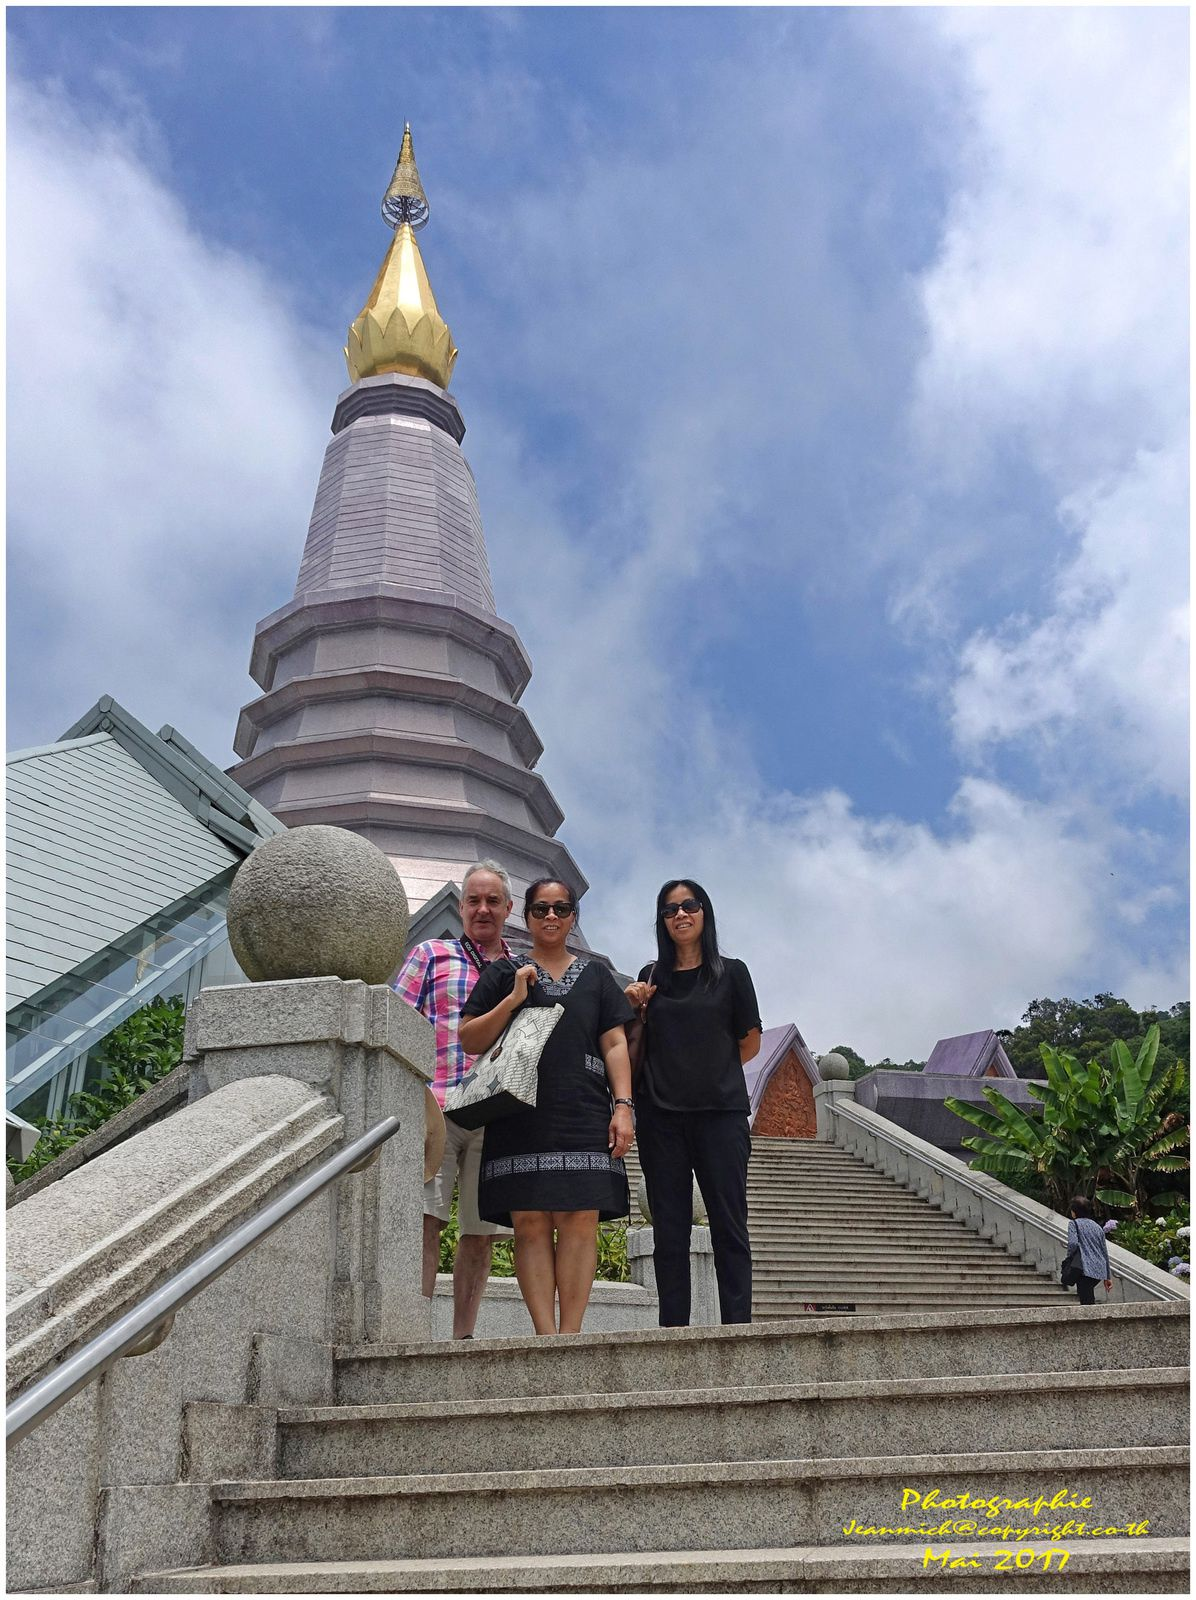 Doi Inthanon les Chedis (I) ดอยอินทนนท์ (Province de Chiang Mai).